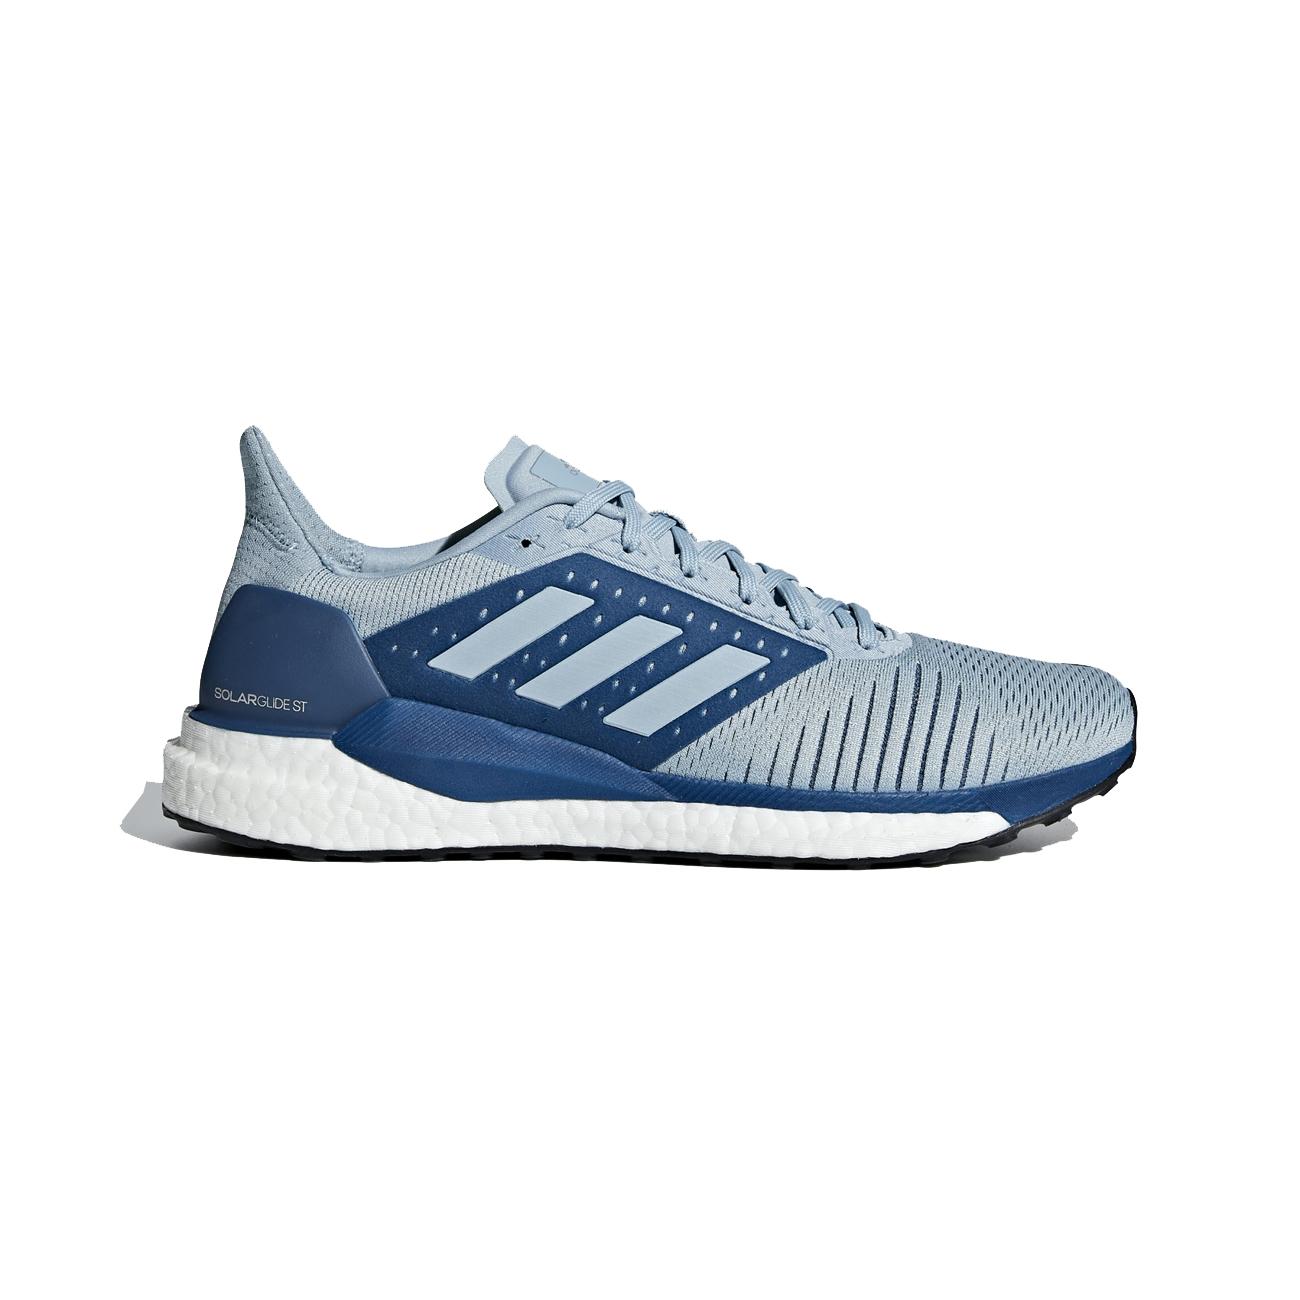 d405430b9ca4e Adidas Men s Solar Glide ST Running Shoes - Ash Grey